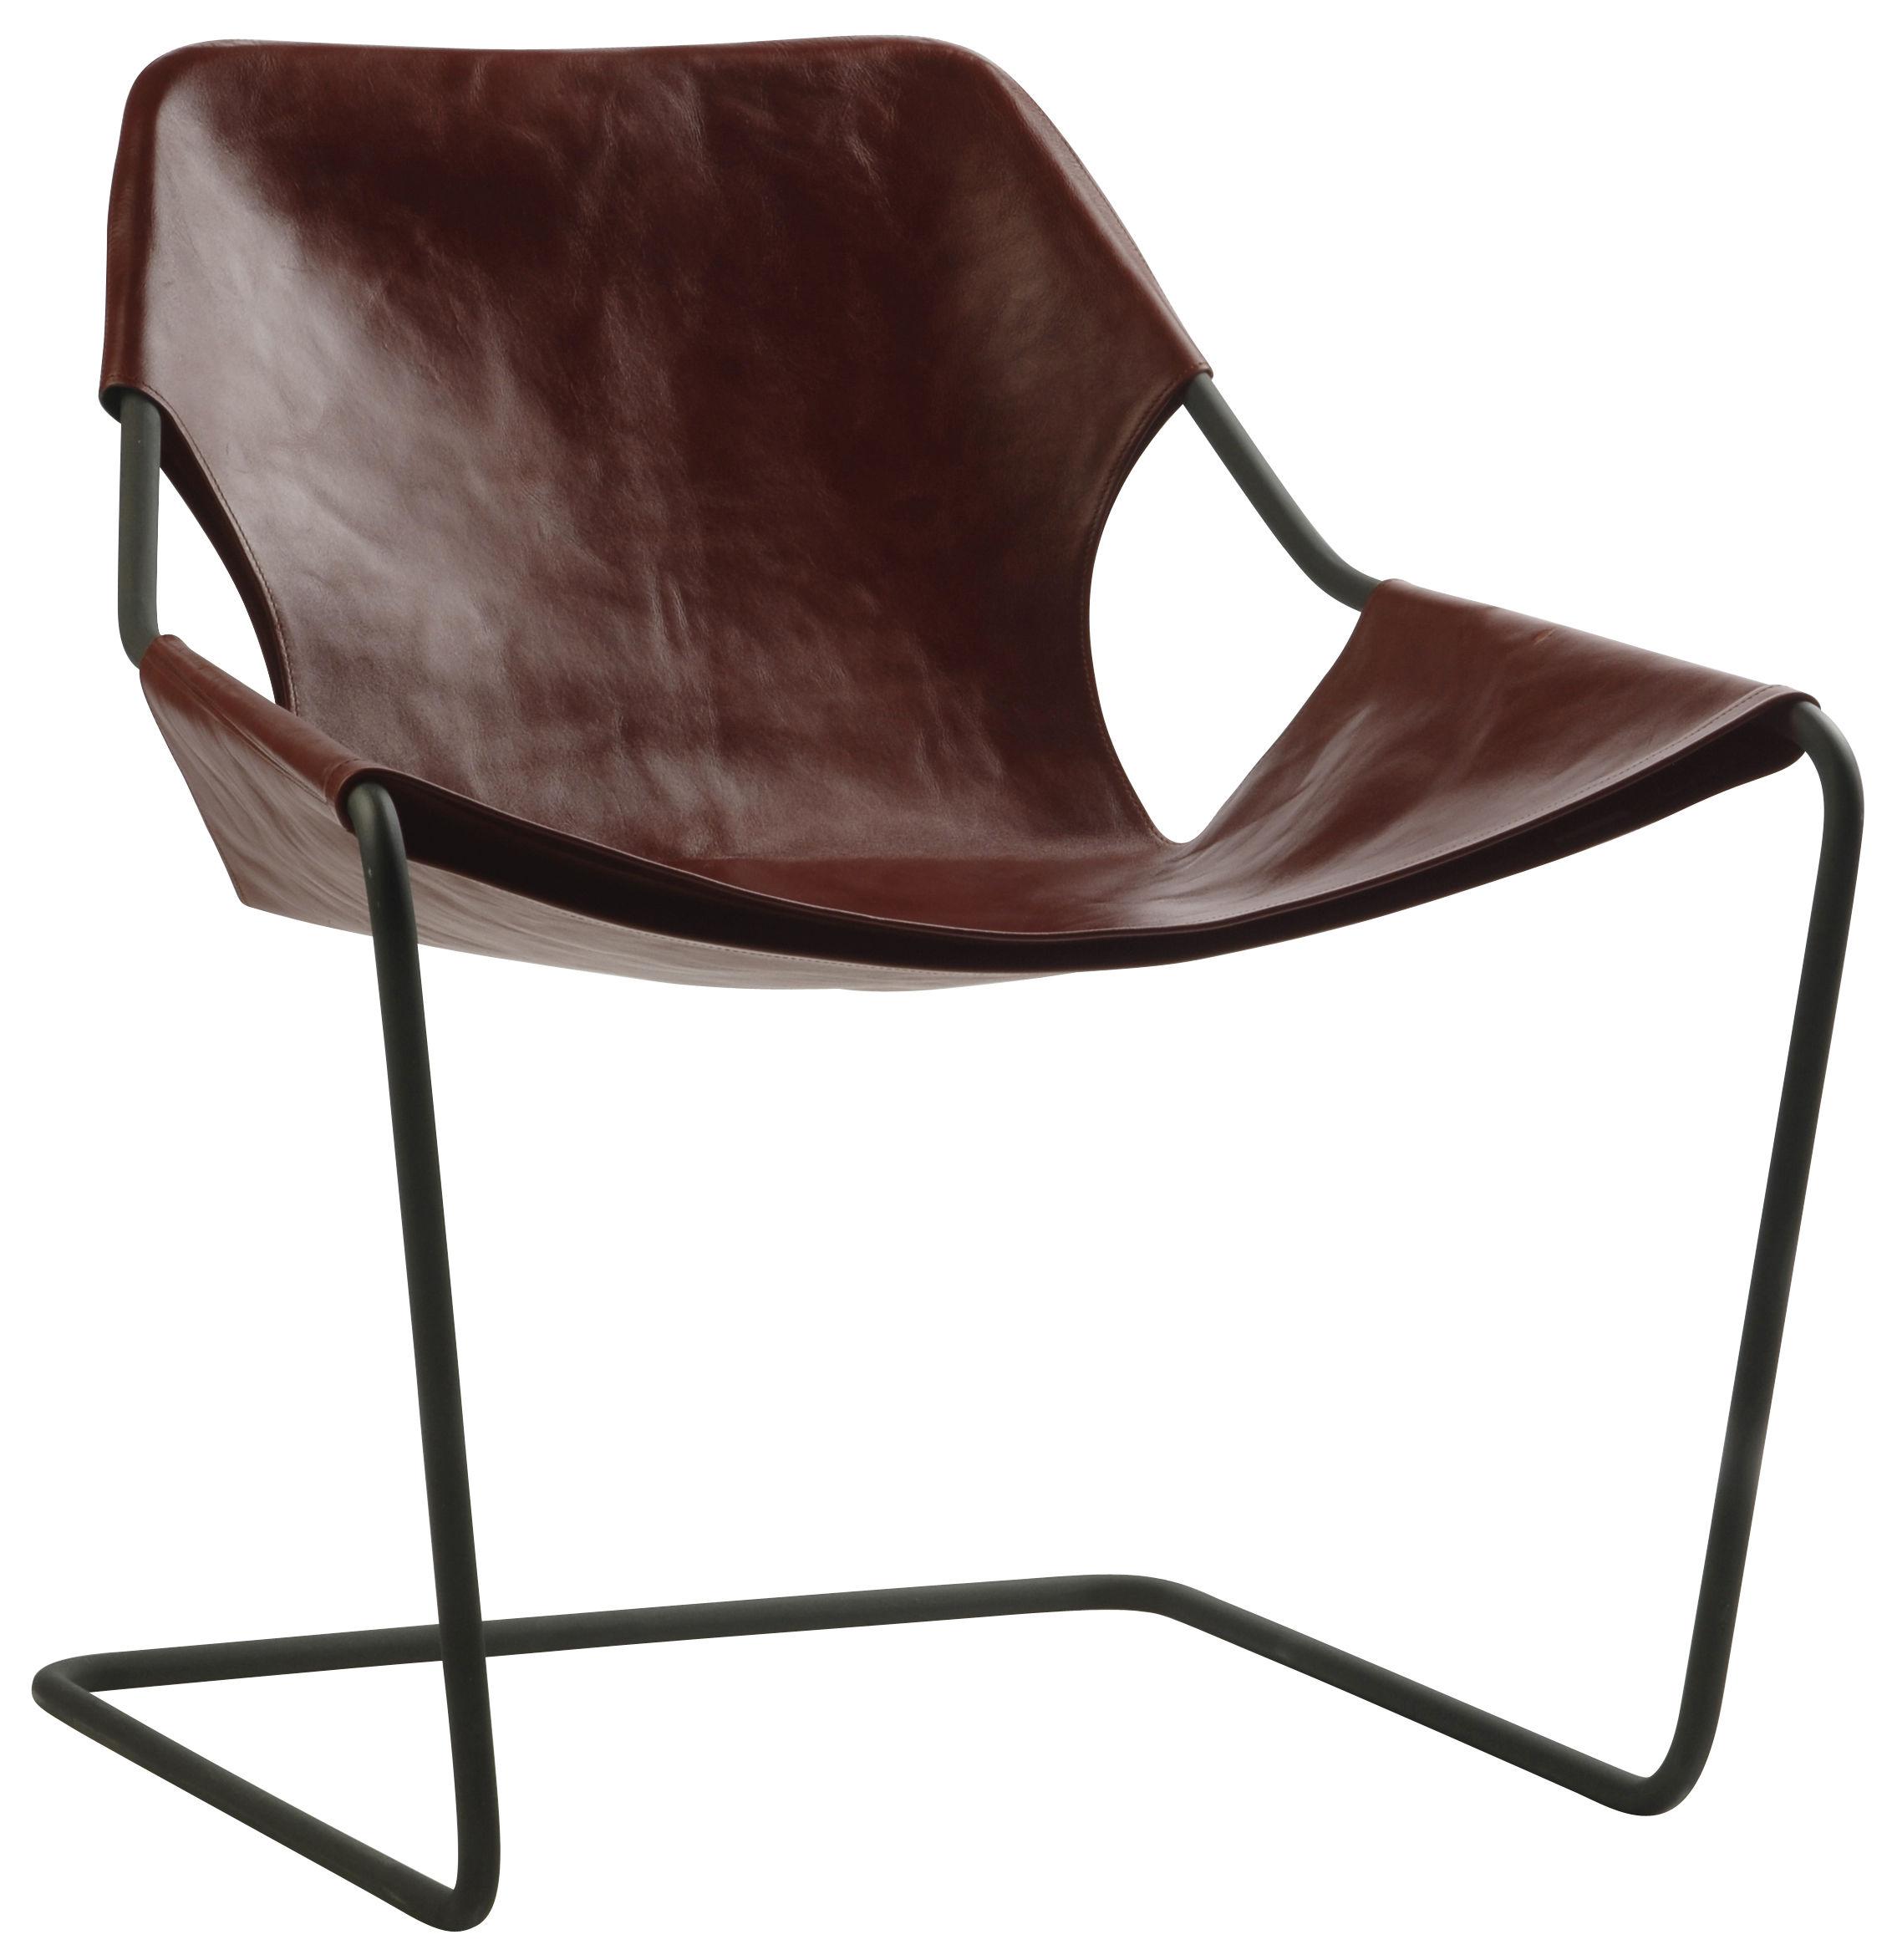 Möbel - Lounge Sessel - Paulistano Sessel Carbon - Objekto - Cognac - Leder